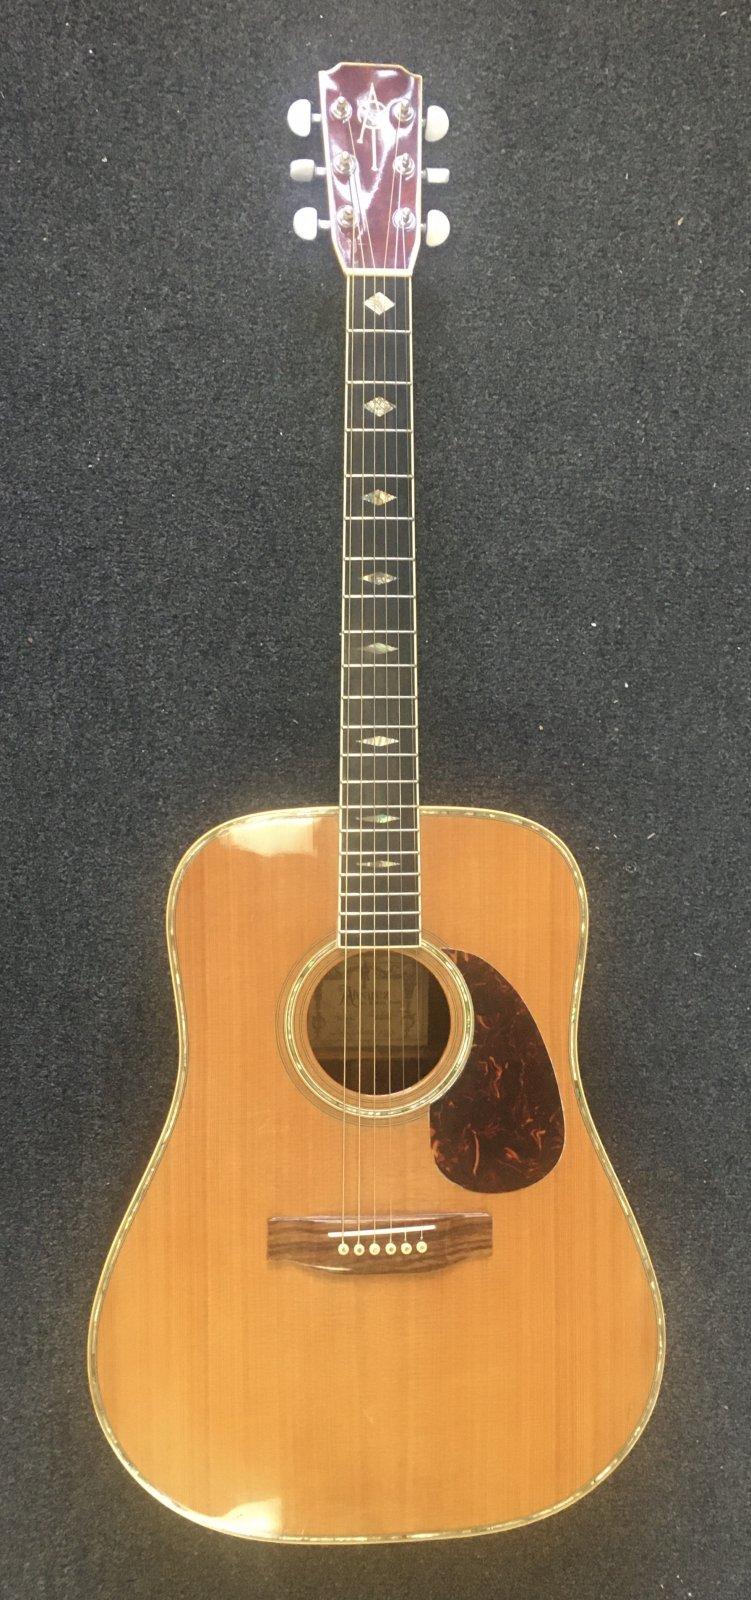 Used Alvarez Yairi DY85 1983 Dreadnought Acoustic Guitar w/case